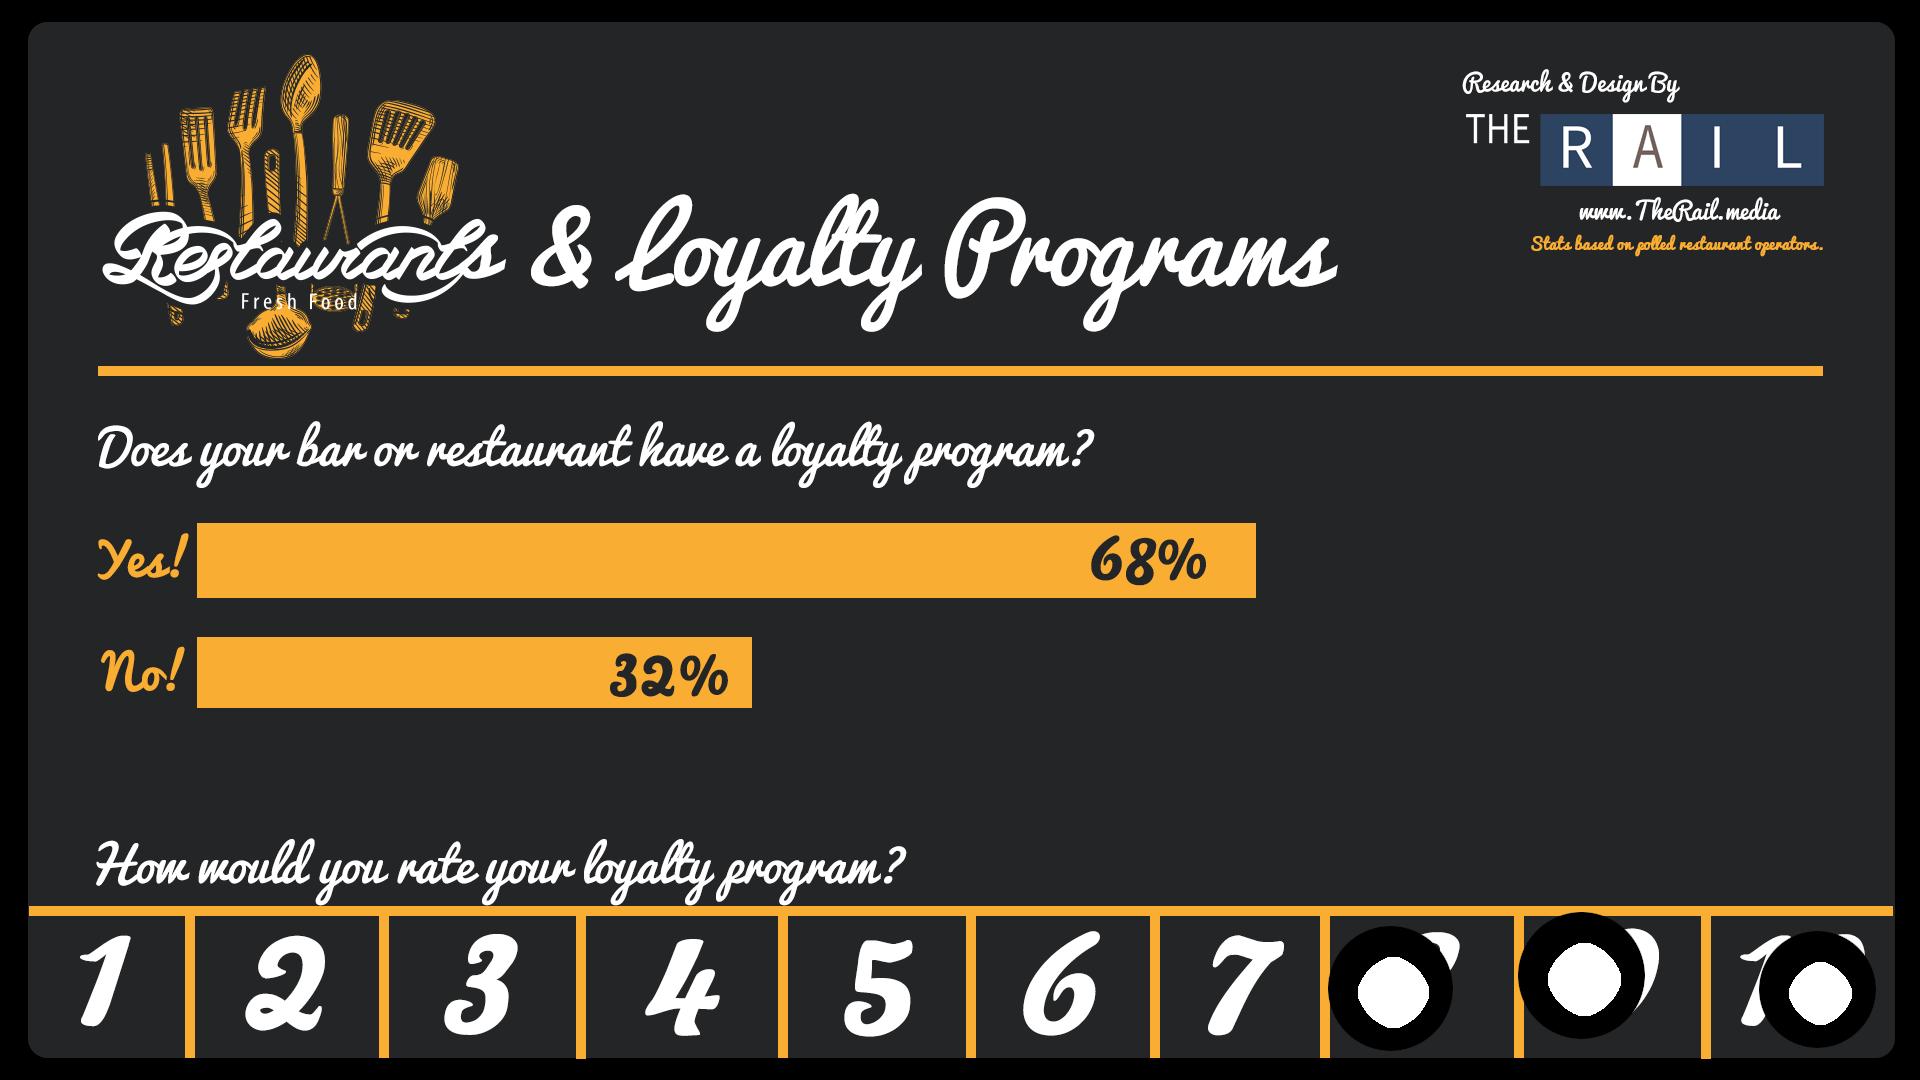 INFOGRAPHIC: Restaurant Loyalty Programs via Citizens of the Rail